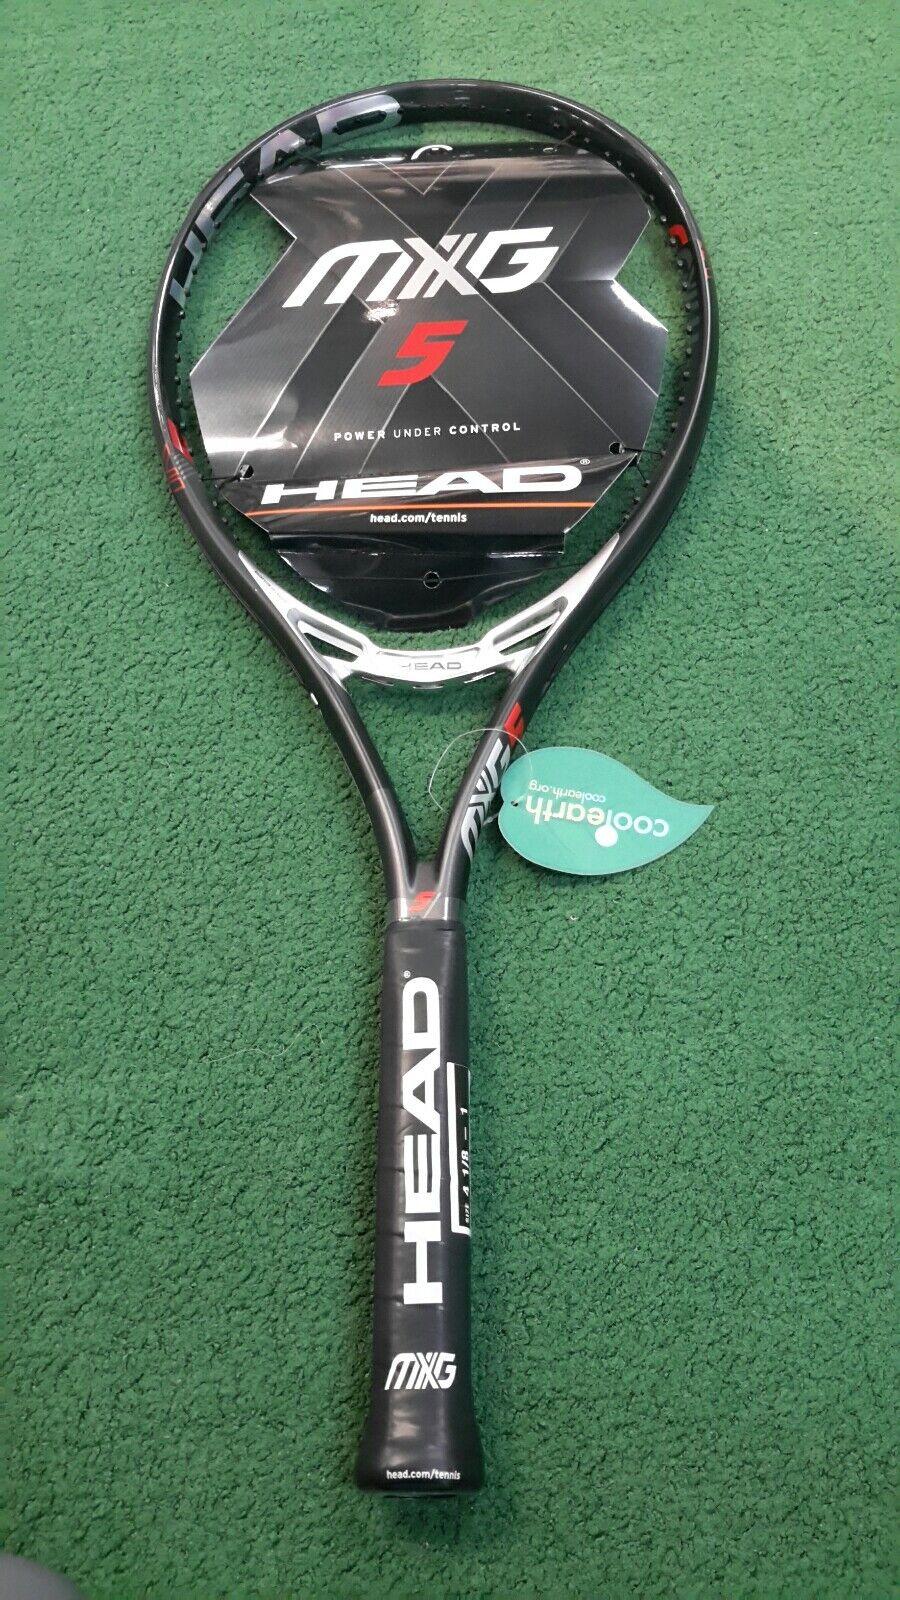 totalmente Nuevo  Mxg cabeza 5 raqueta de tenis, viene encordada